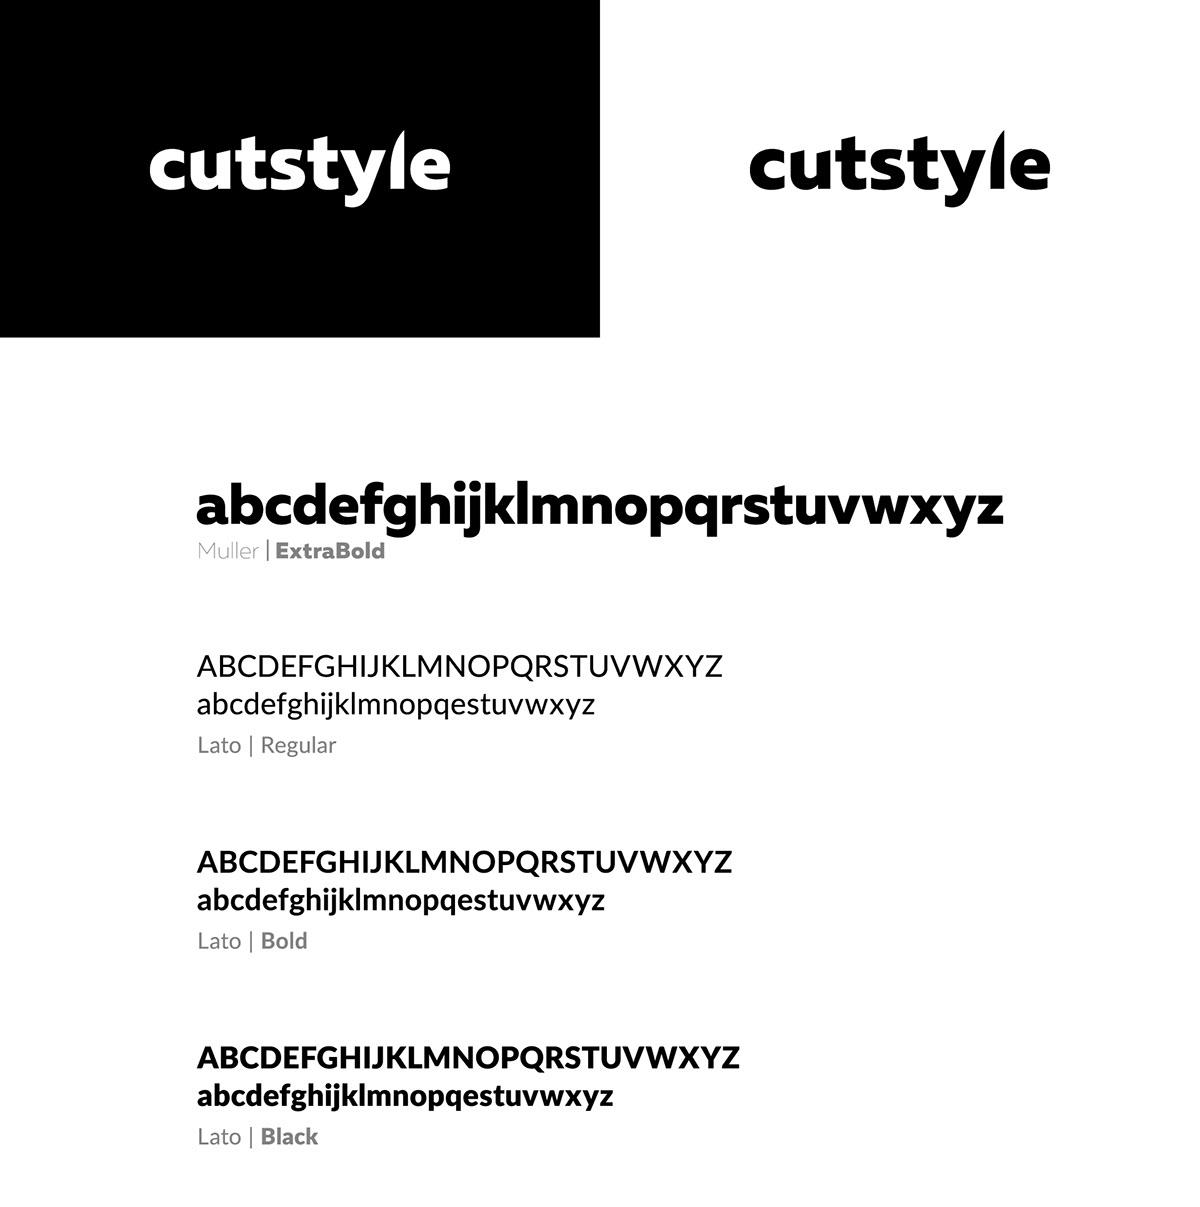 knife knfies cutstyle cut branding  brand xomedia xo media visual identity black and white